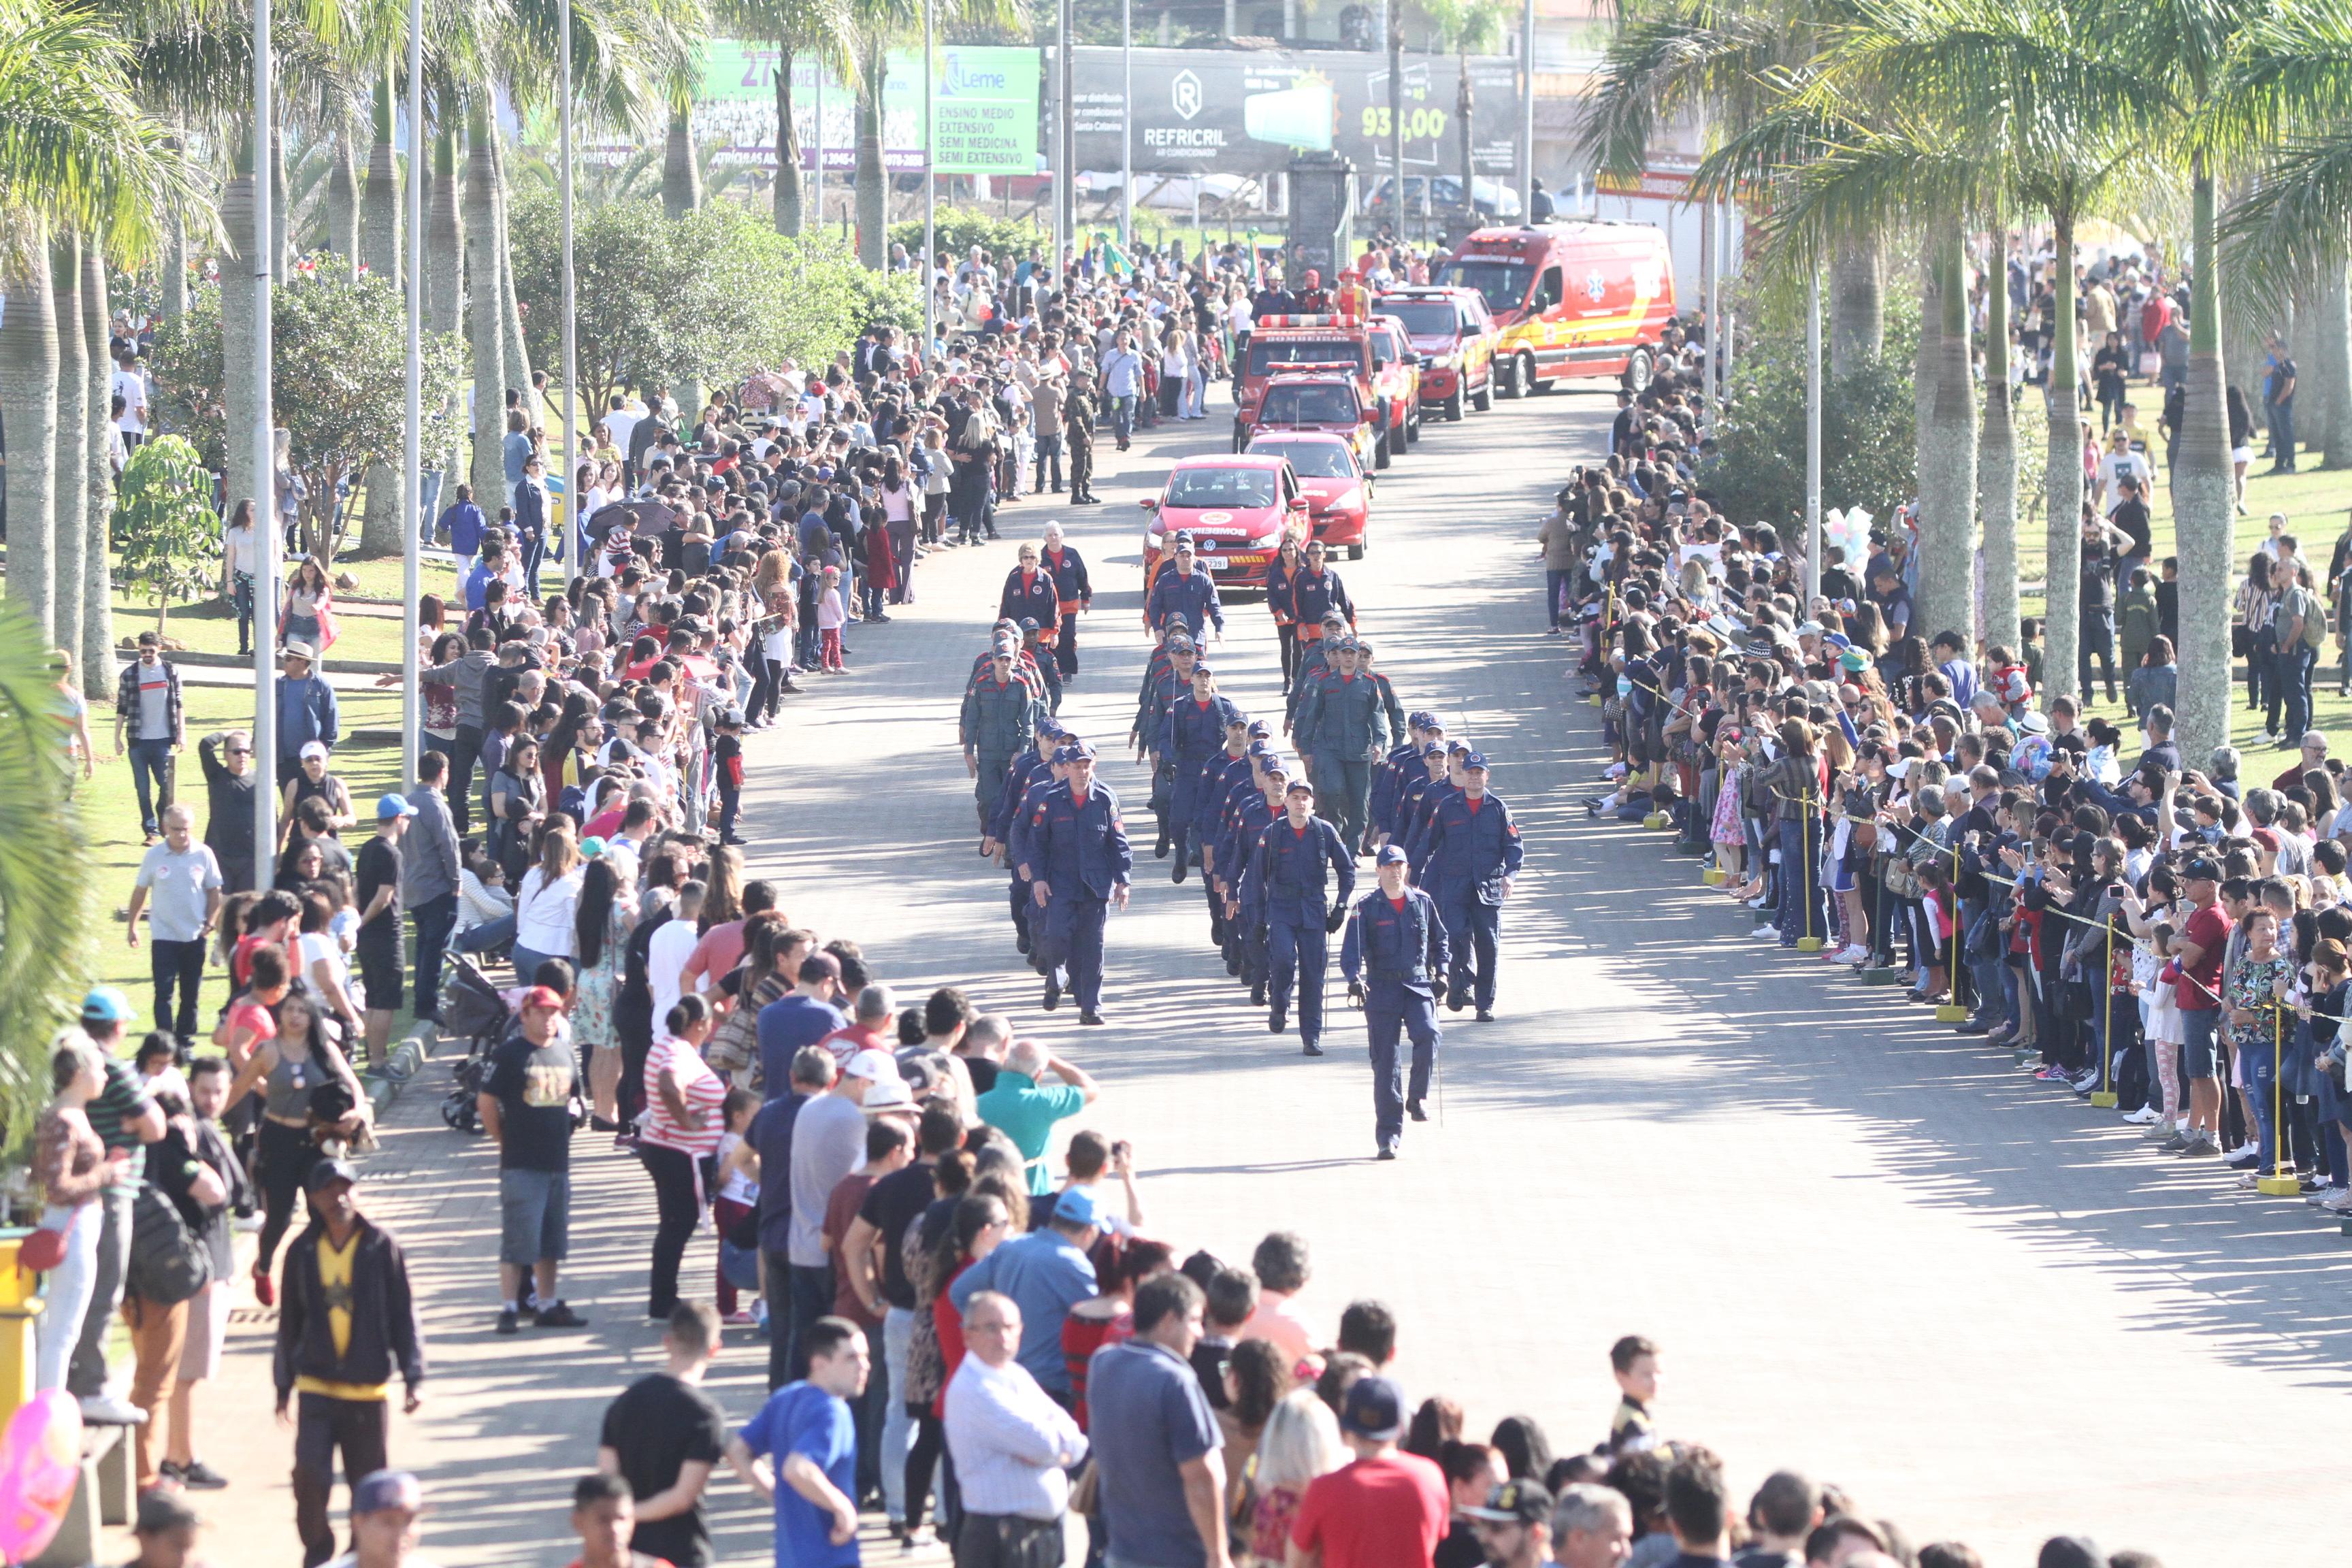 Lucas-Colombo-Desfile-de-7-de-Setembro-Parque-das-Nções-3